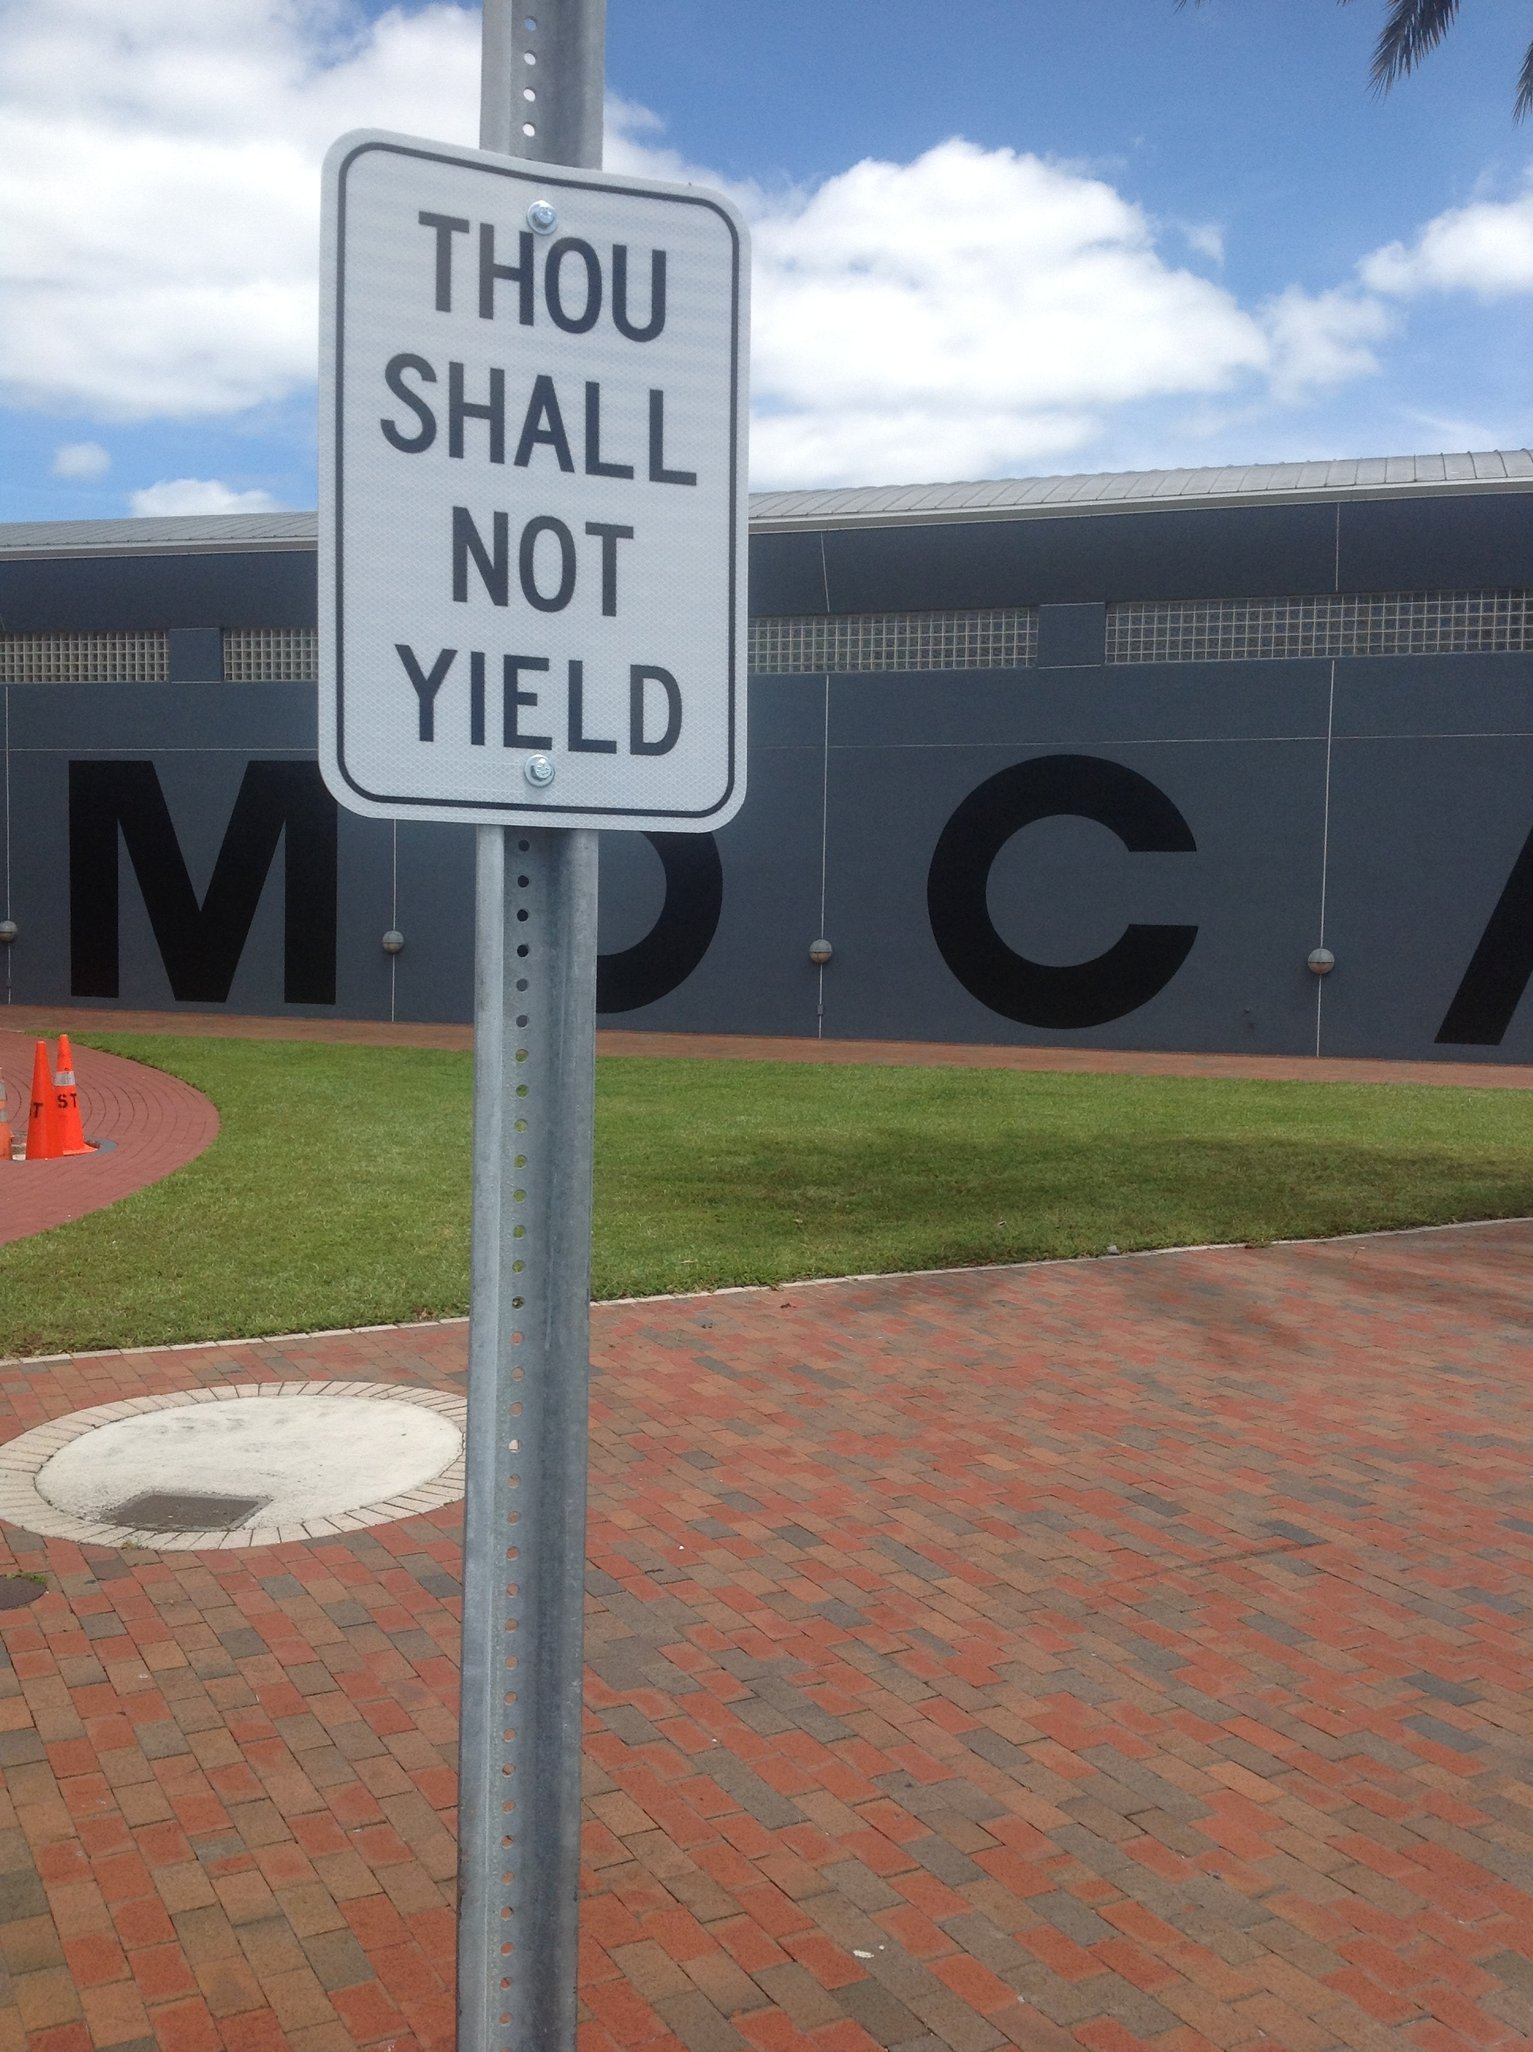 DPW N. Miami_MOCA Thou shall.jpg